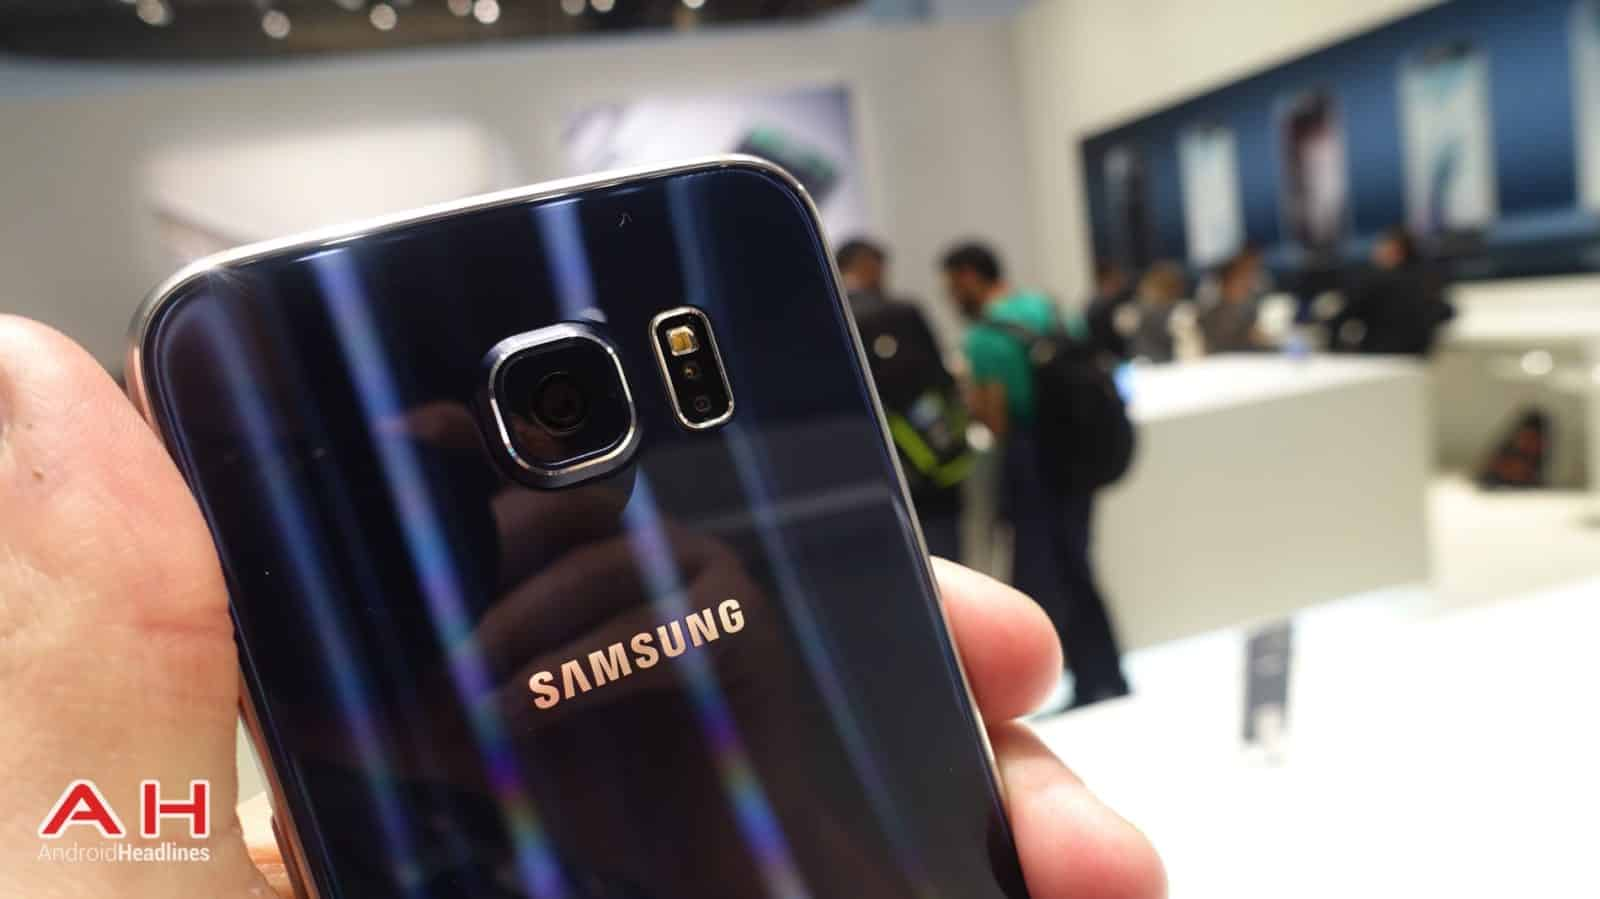 Galaxy S6 and Galaxy S6 Edge MWC AH 14